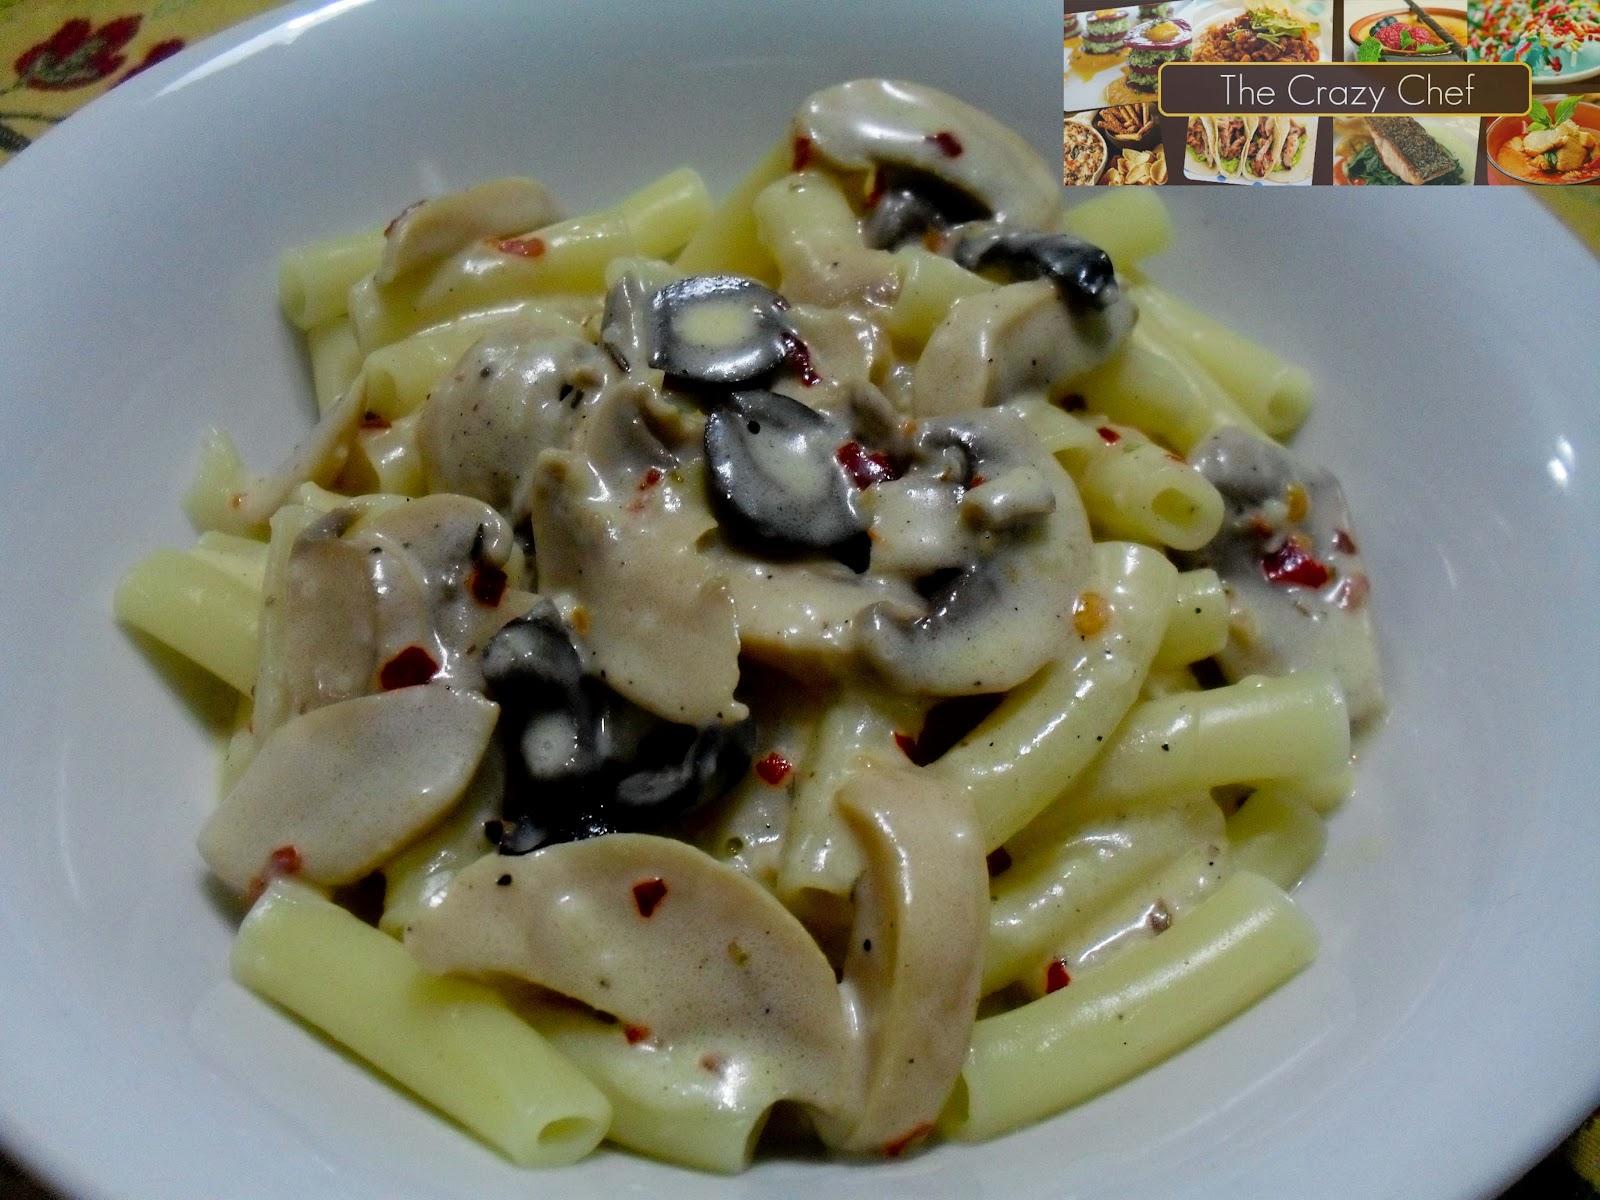 The Crazy Chef: Creamy Mushroom Pasta